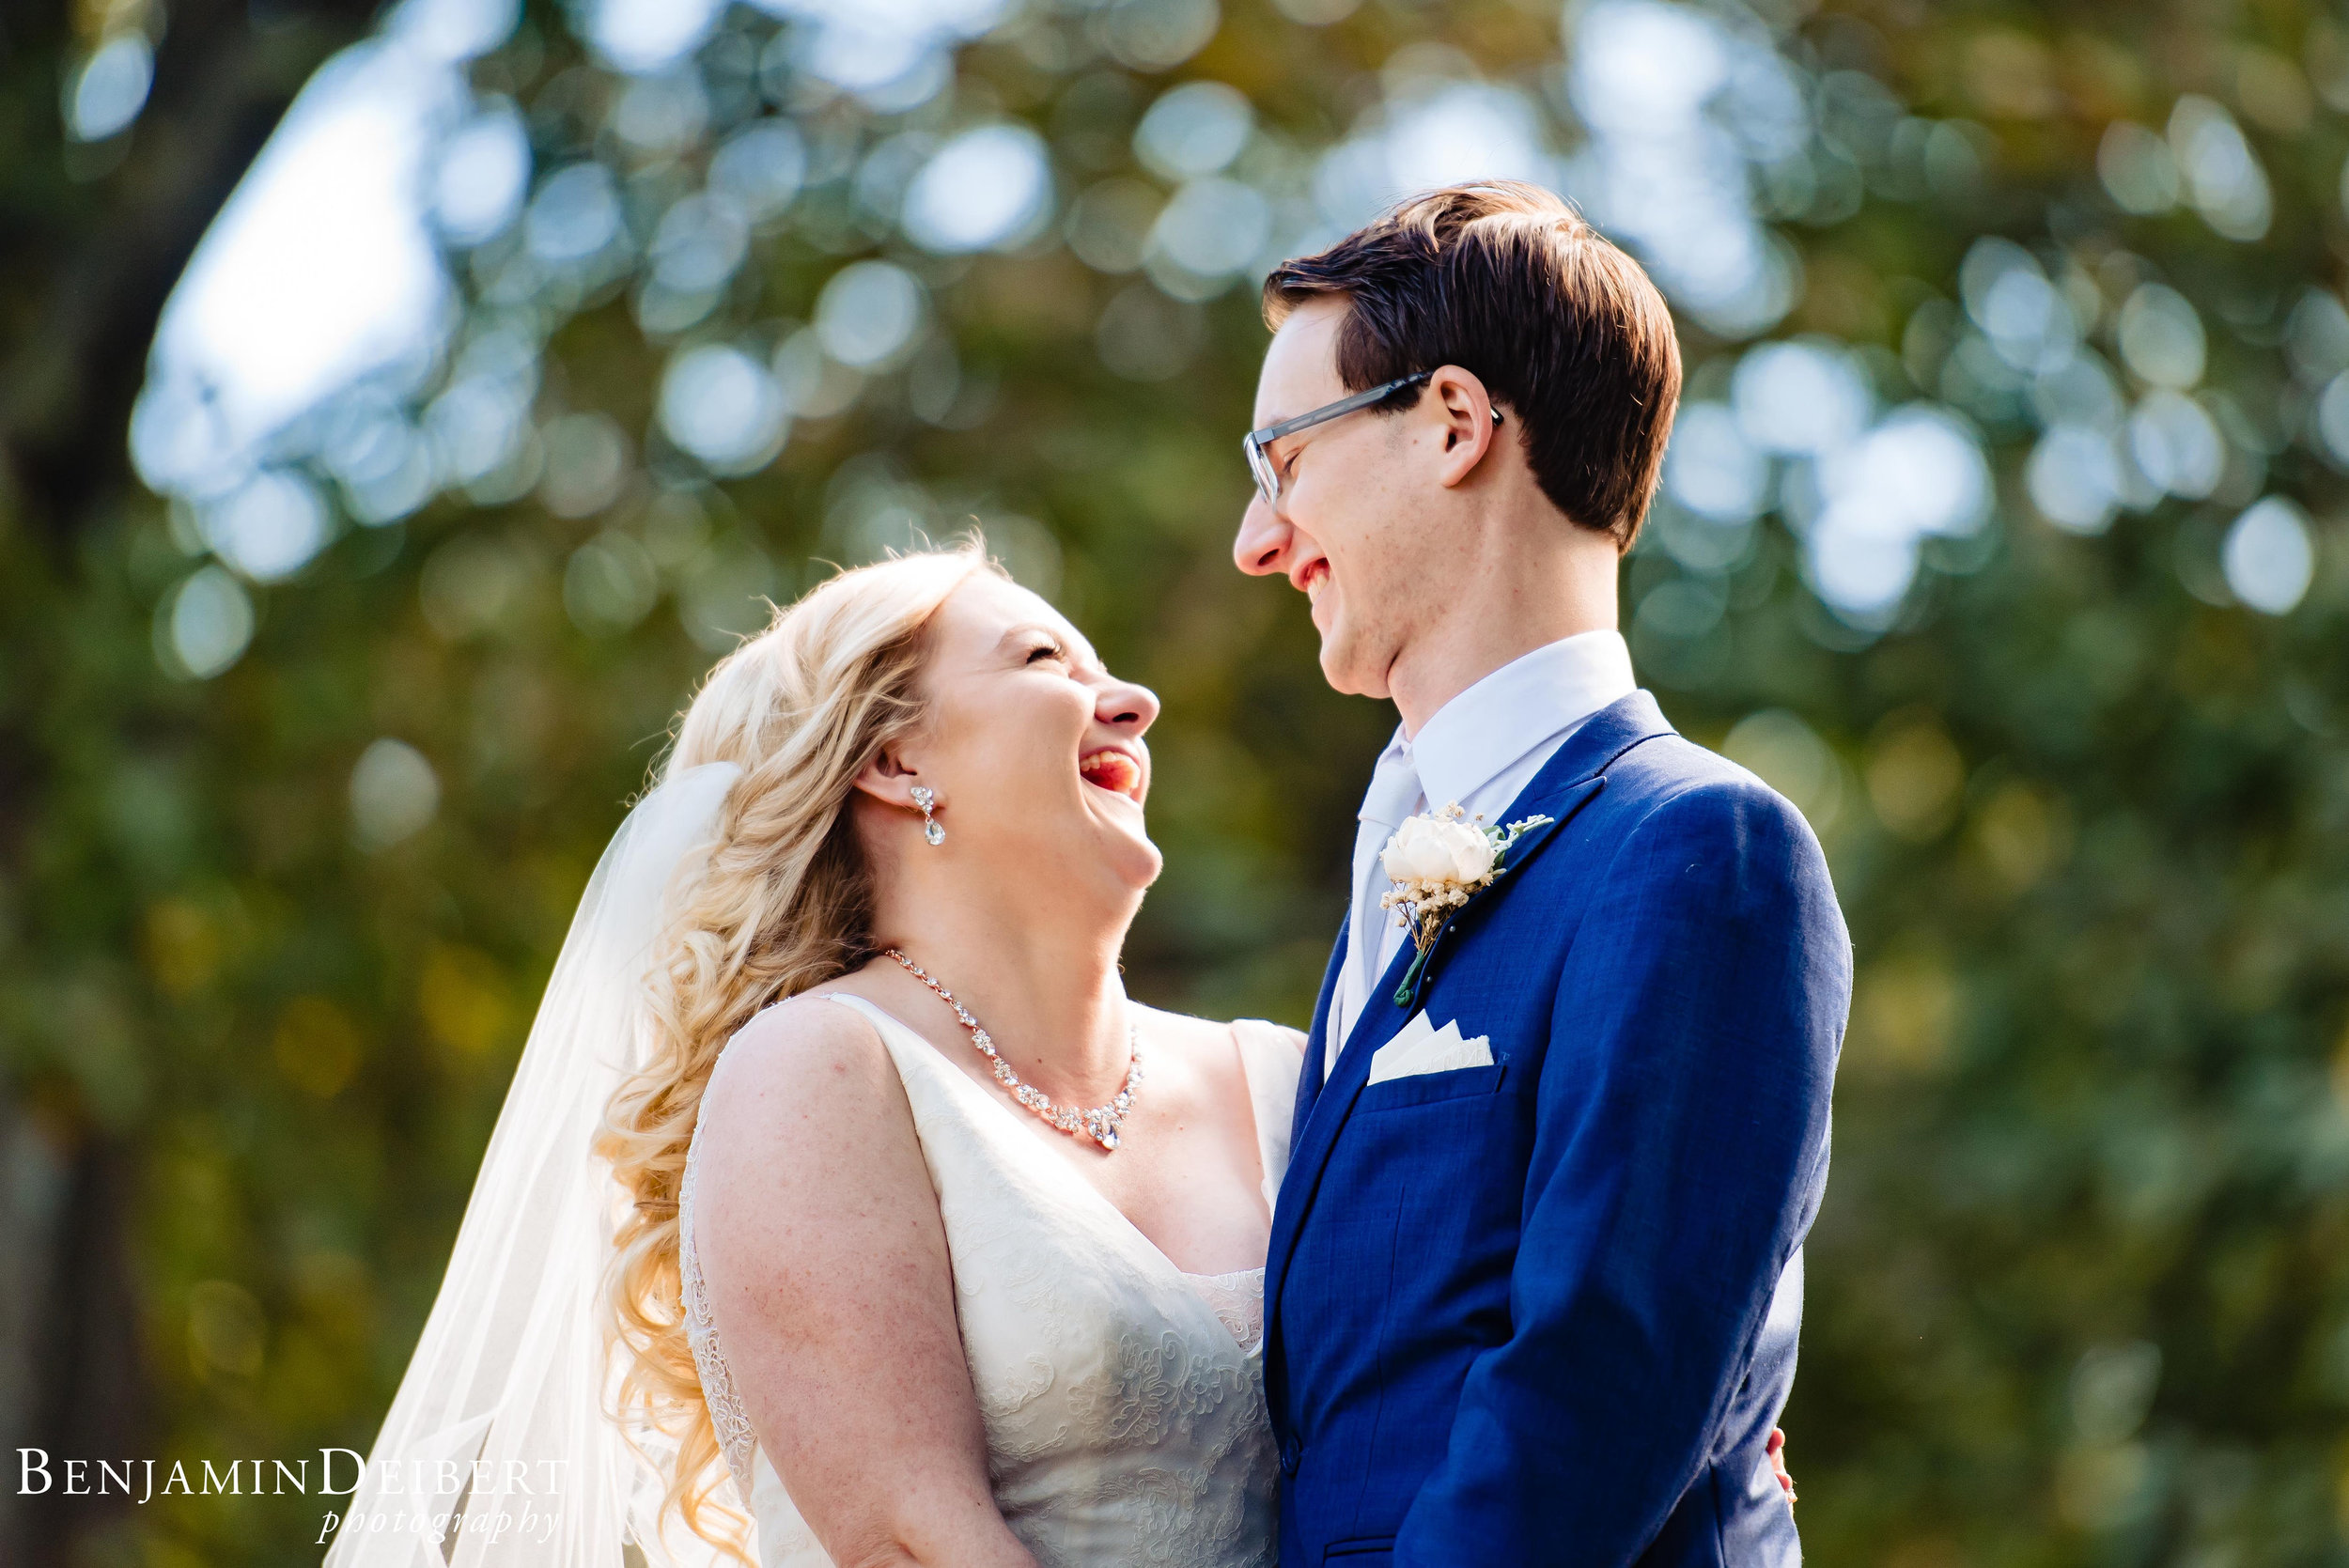 AshleyandDerrick_RadnorValleyCountryClub_Wedding-34.jpg